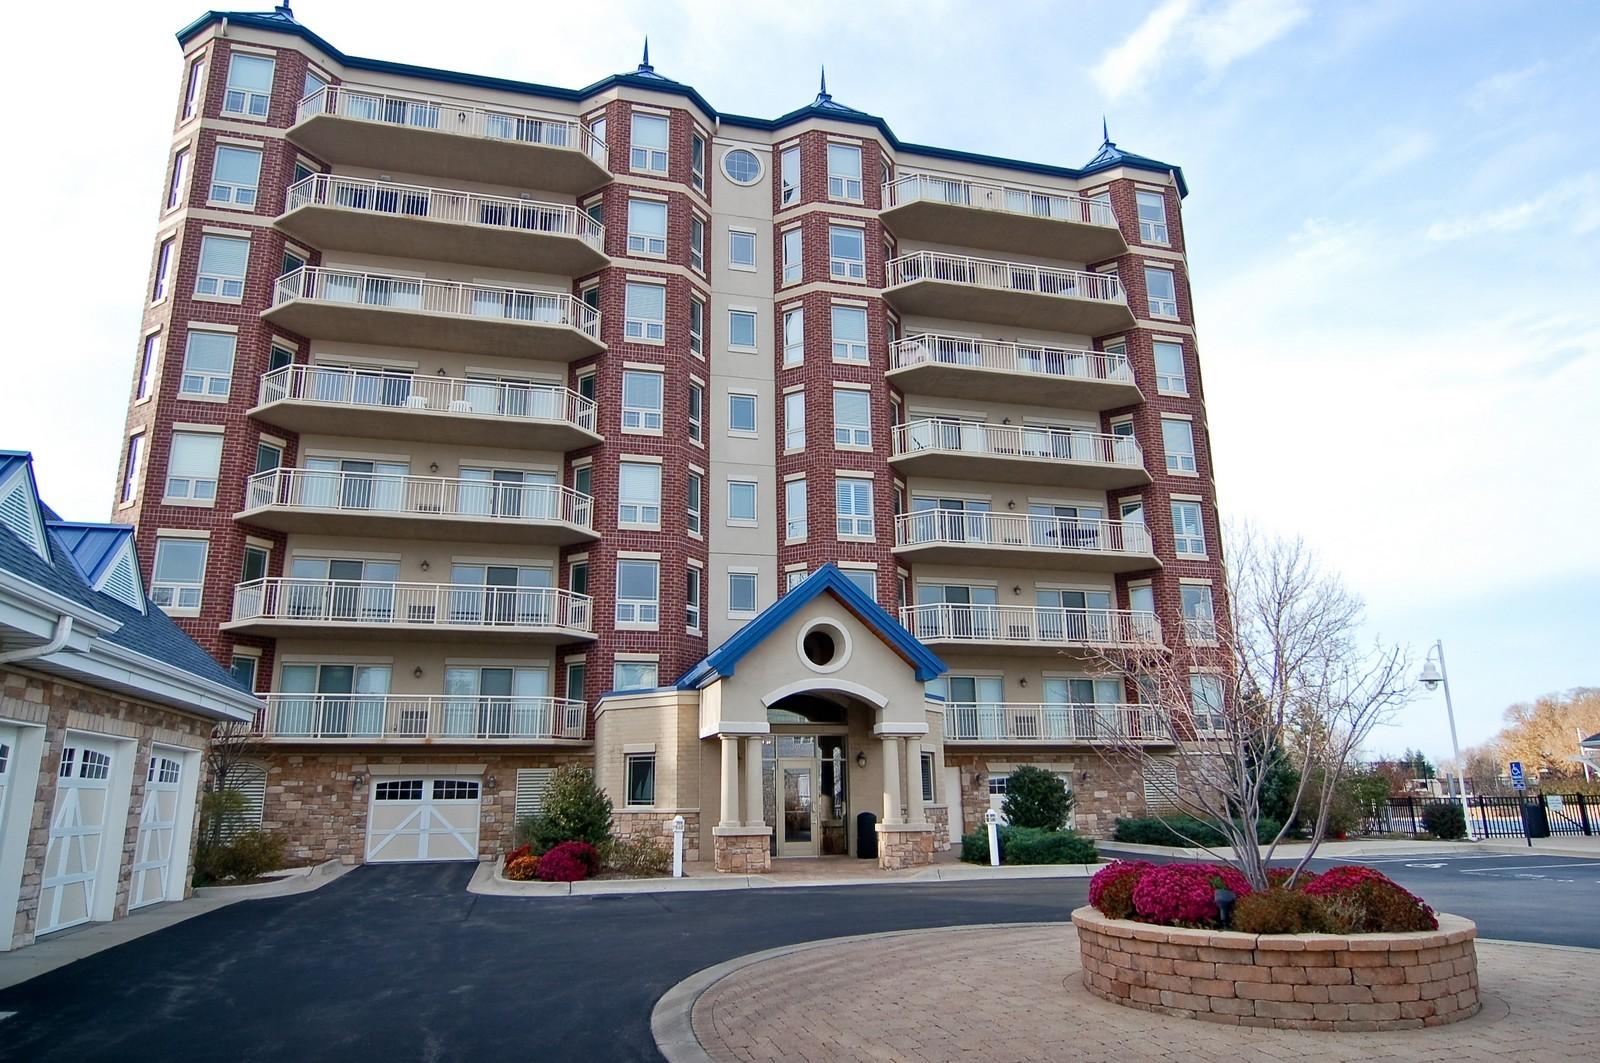 Real Estate Photography - 200- 7B Lake Street, St Joseph, MI, 49085 - Front View